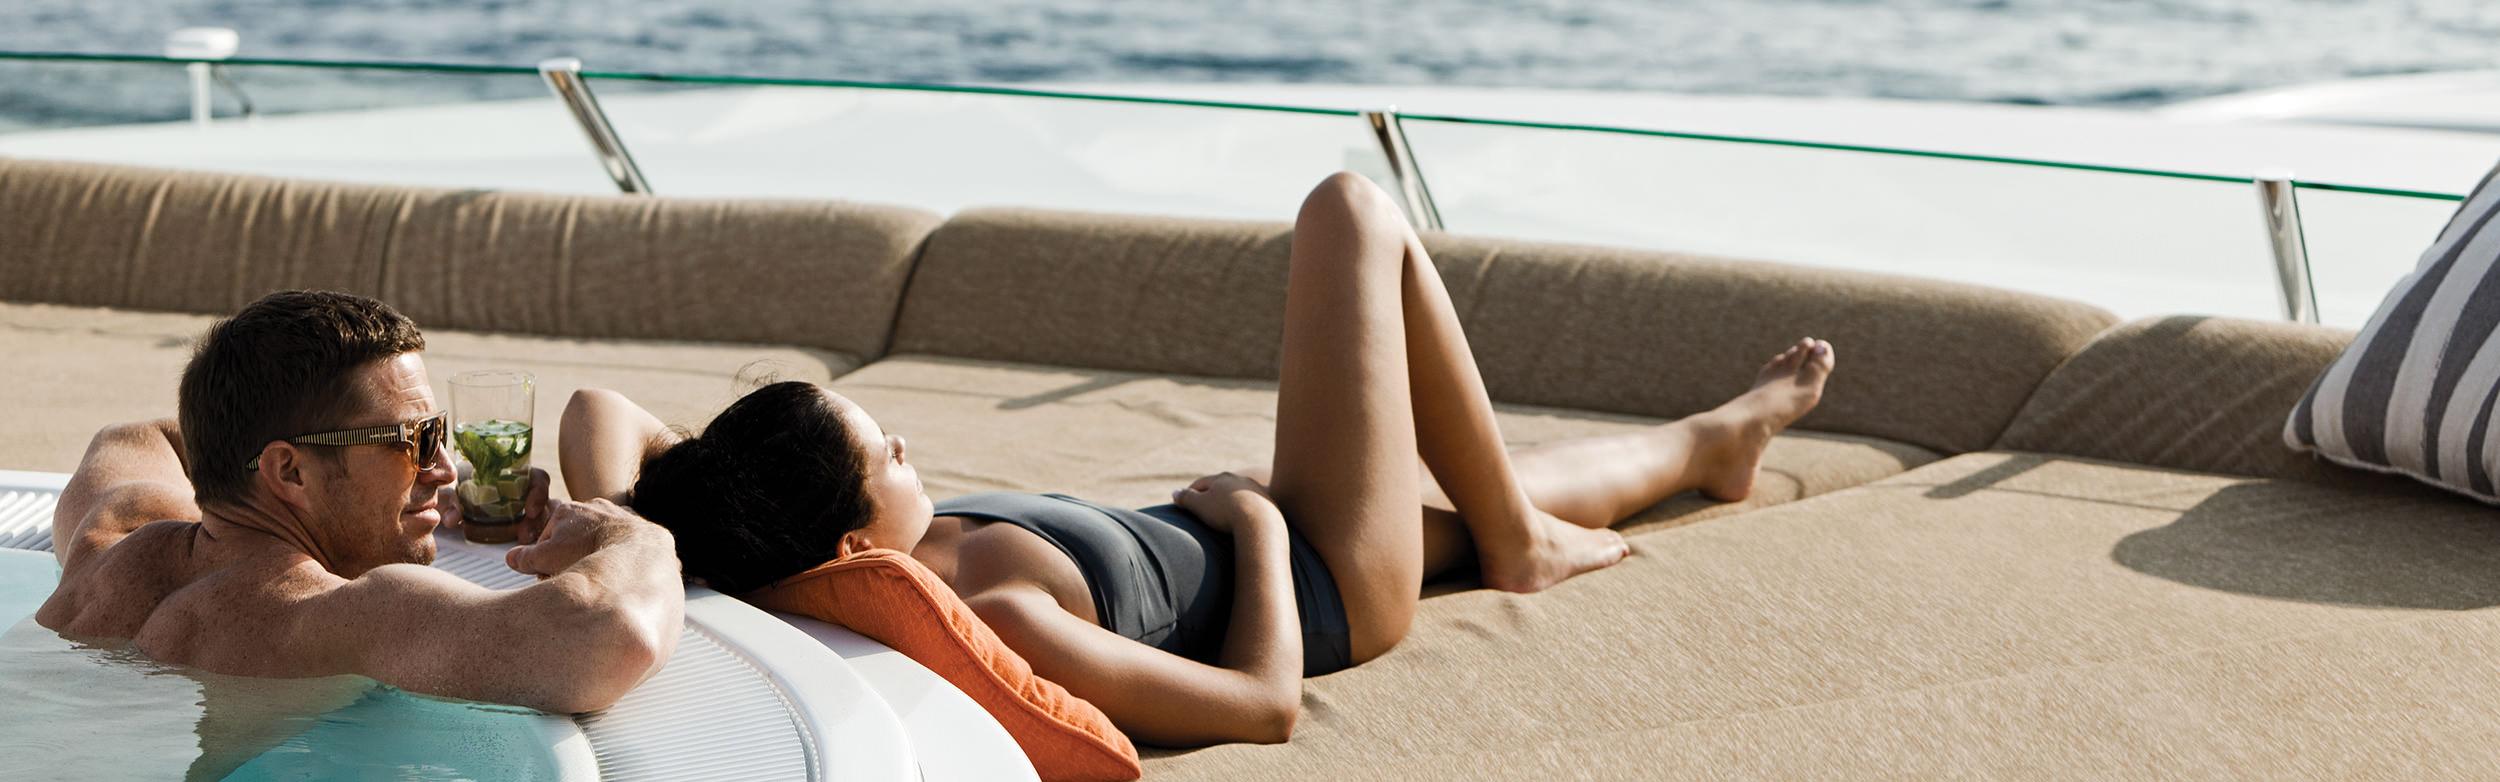 Antropoti-yacht-sailing-adriatic